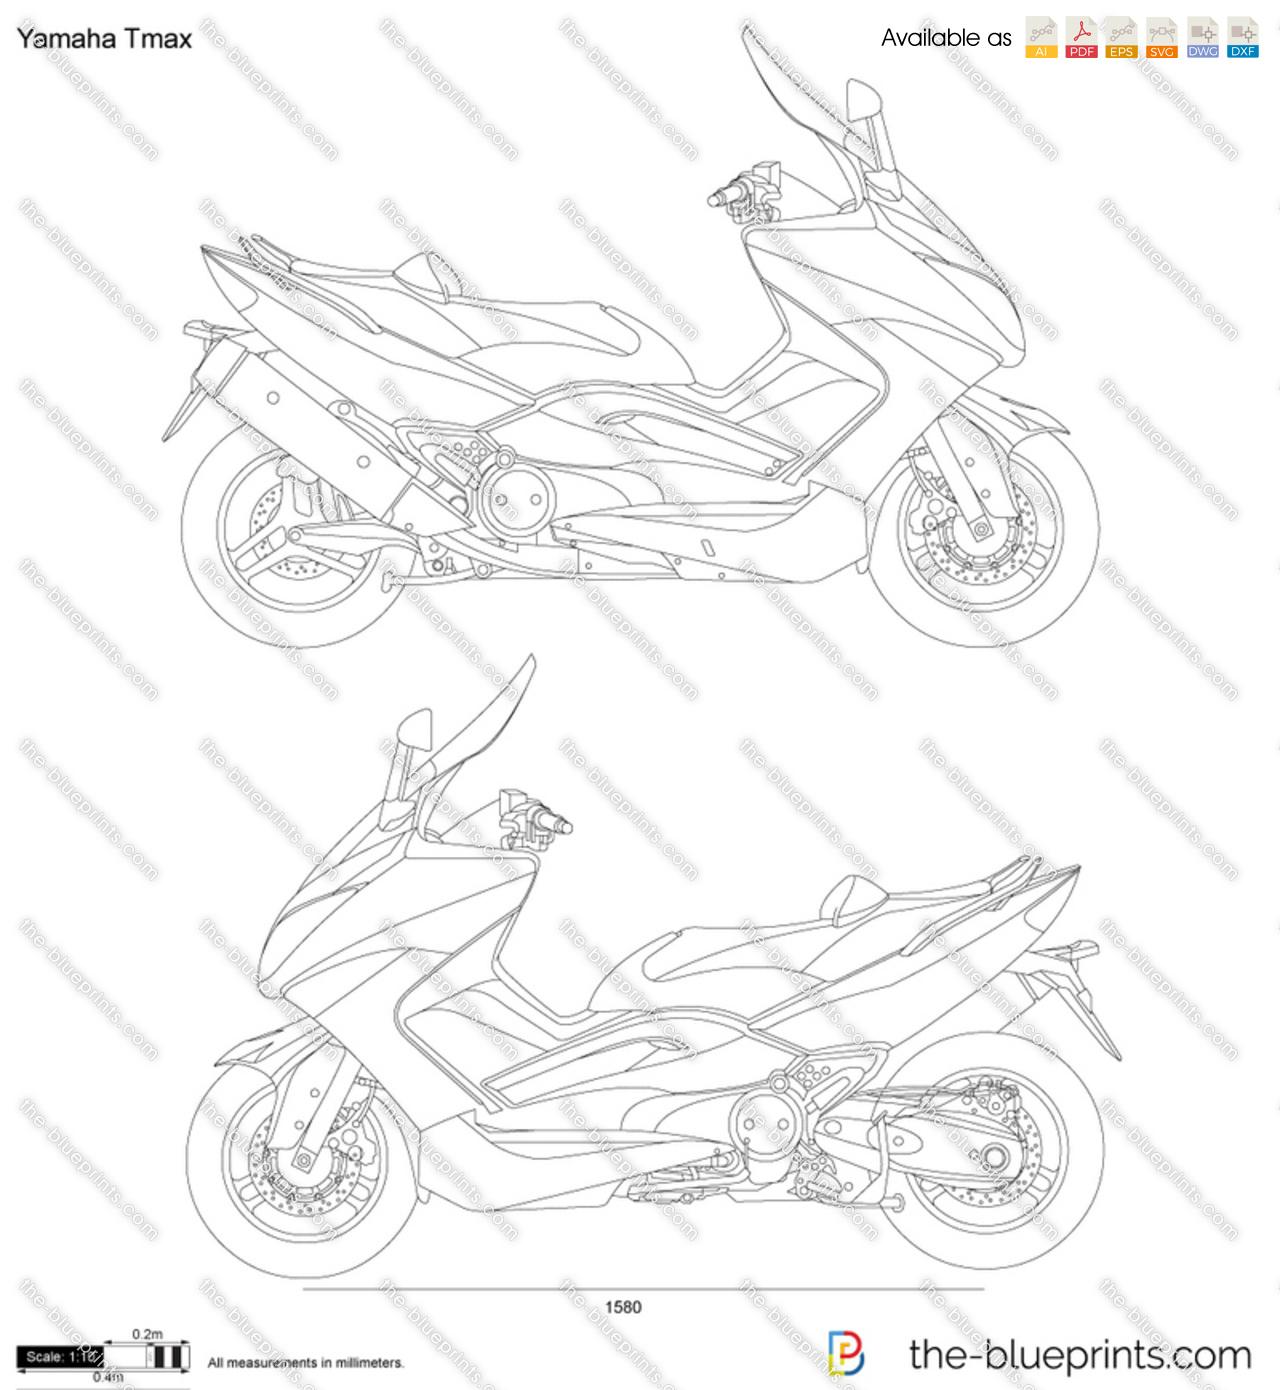 Yamaha Tmax vector drawing